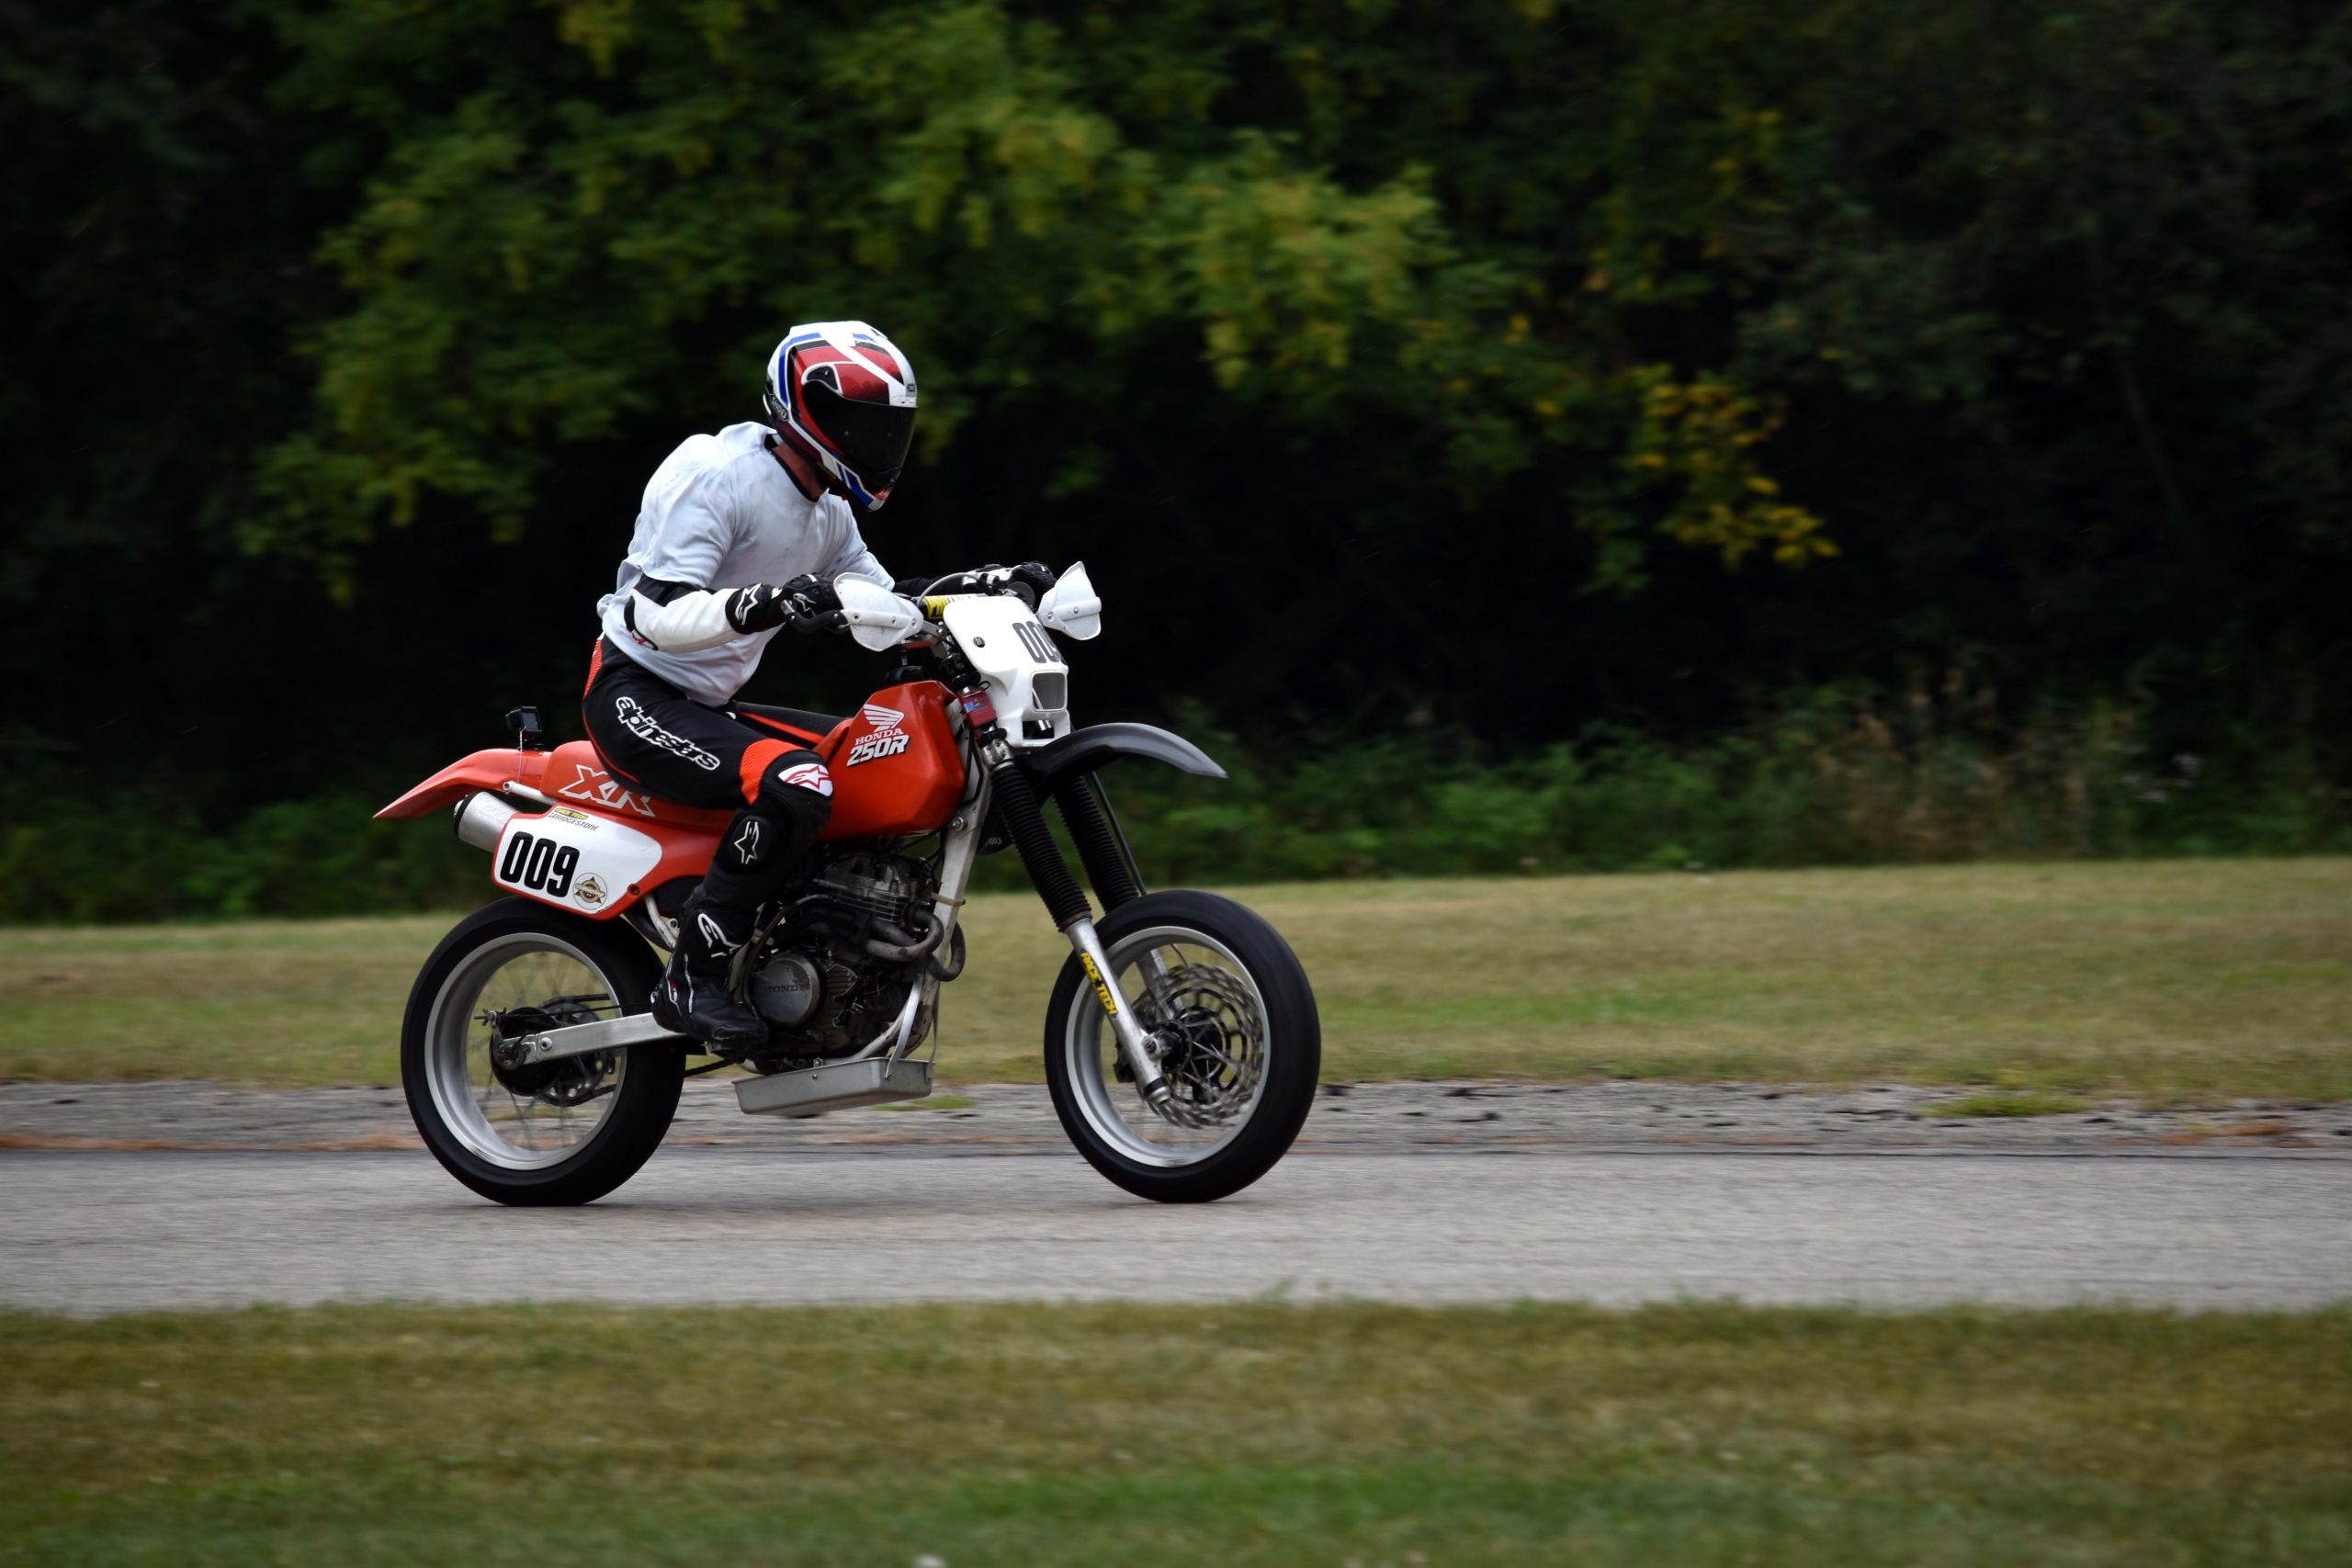 Honda XR250 on track Blackhawk Farms 2